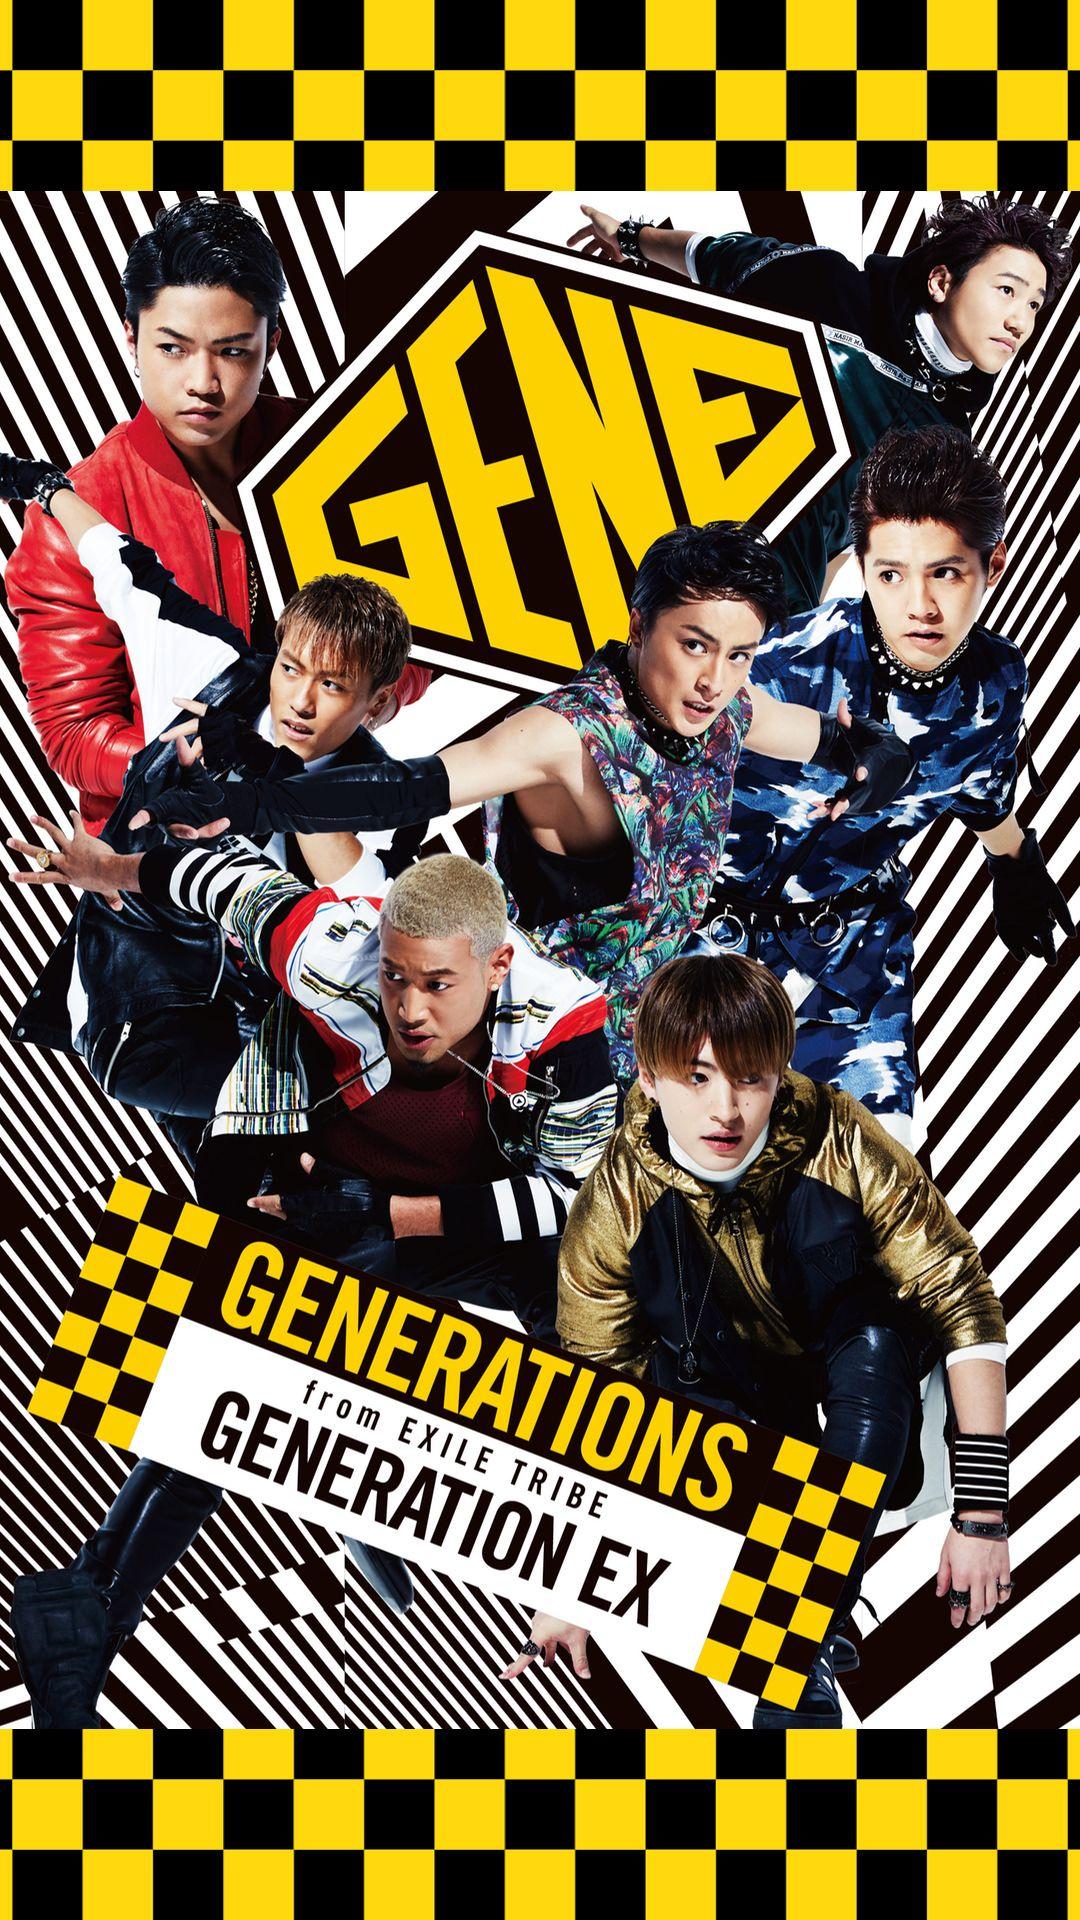 Generations From Exile Tribe ジェネレーションズ Iphone用 その4 無料 高画質スマホ壁紙 Net Days アニメ ジェネレーションズ ジェネレーション